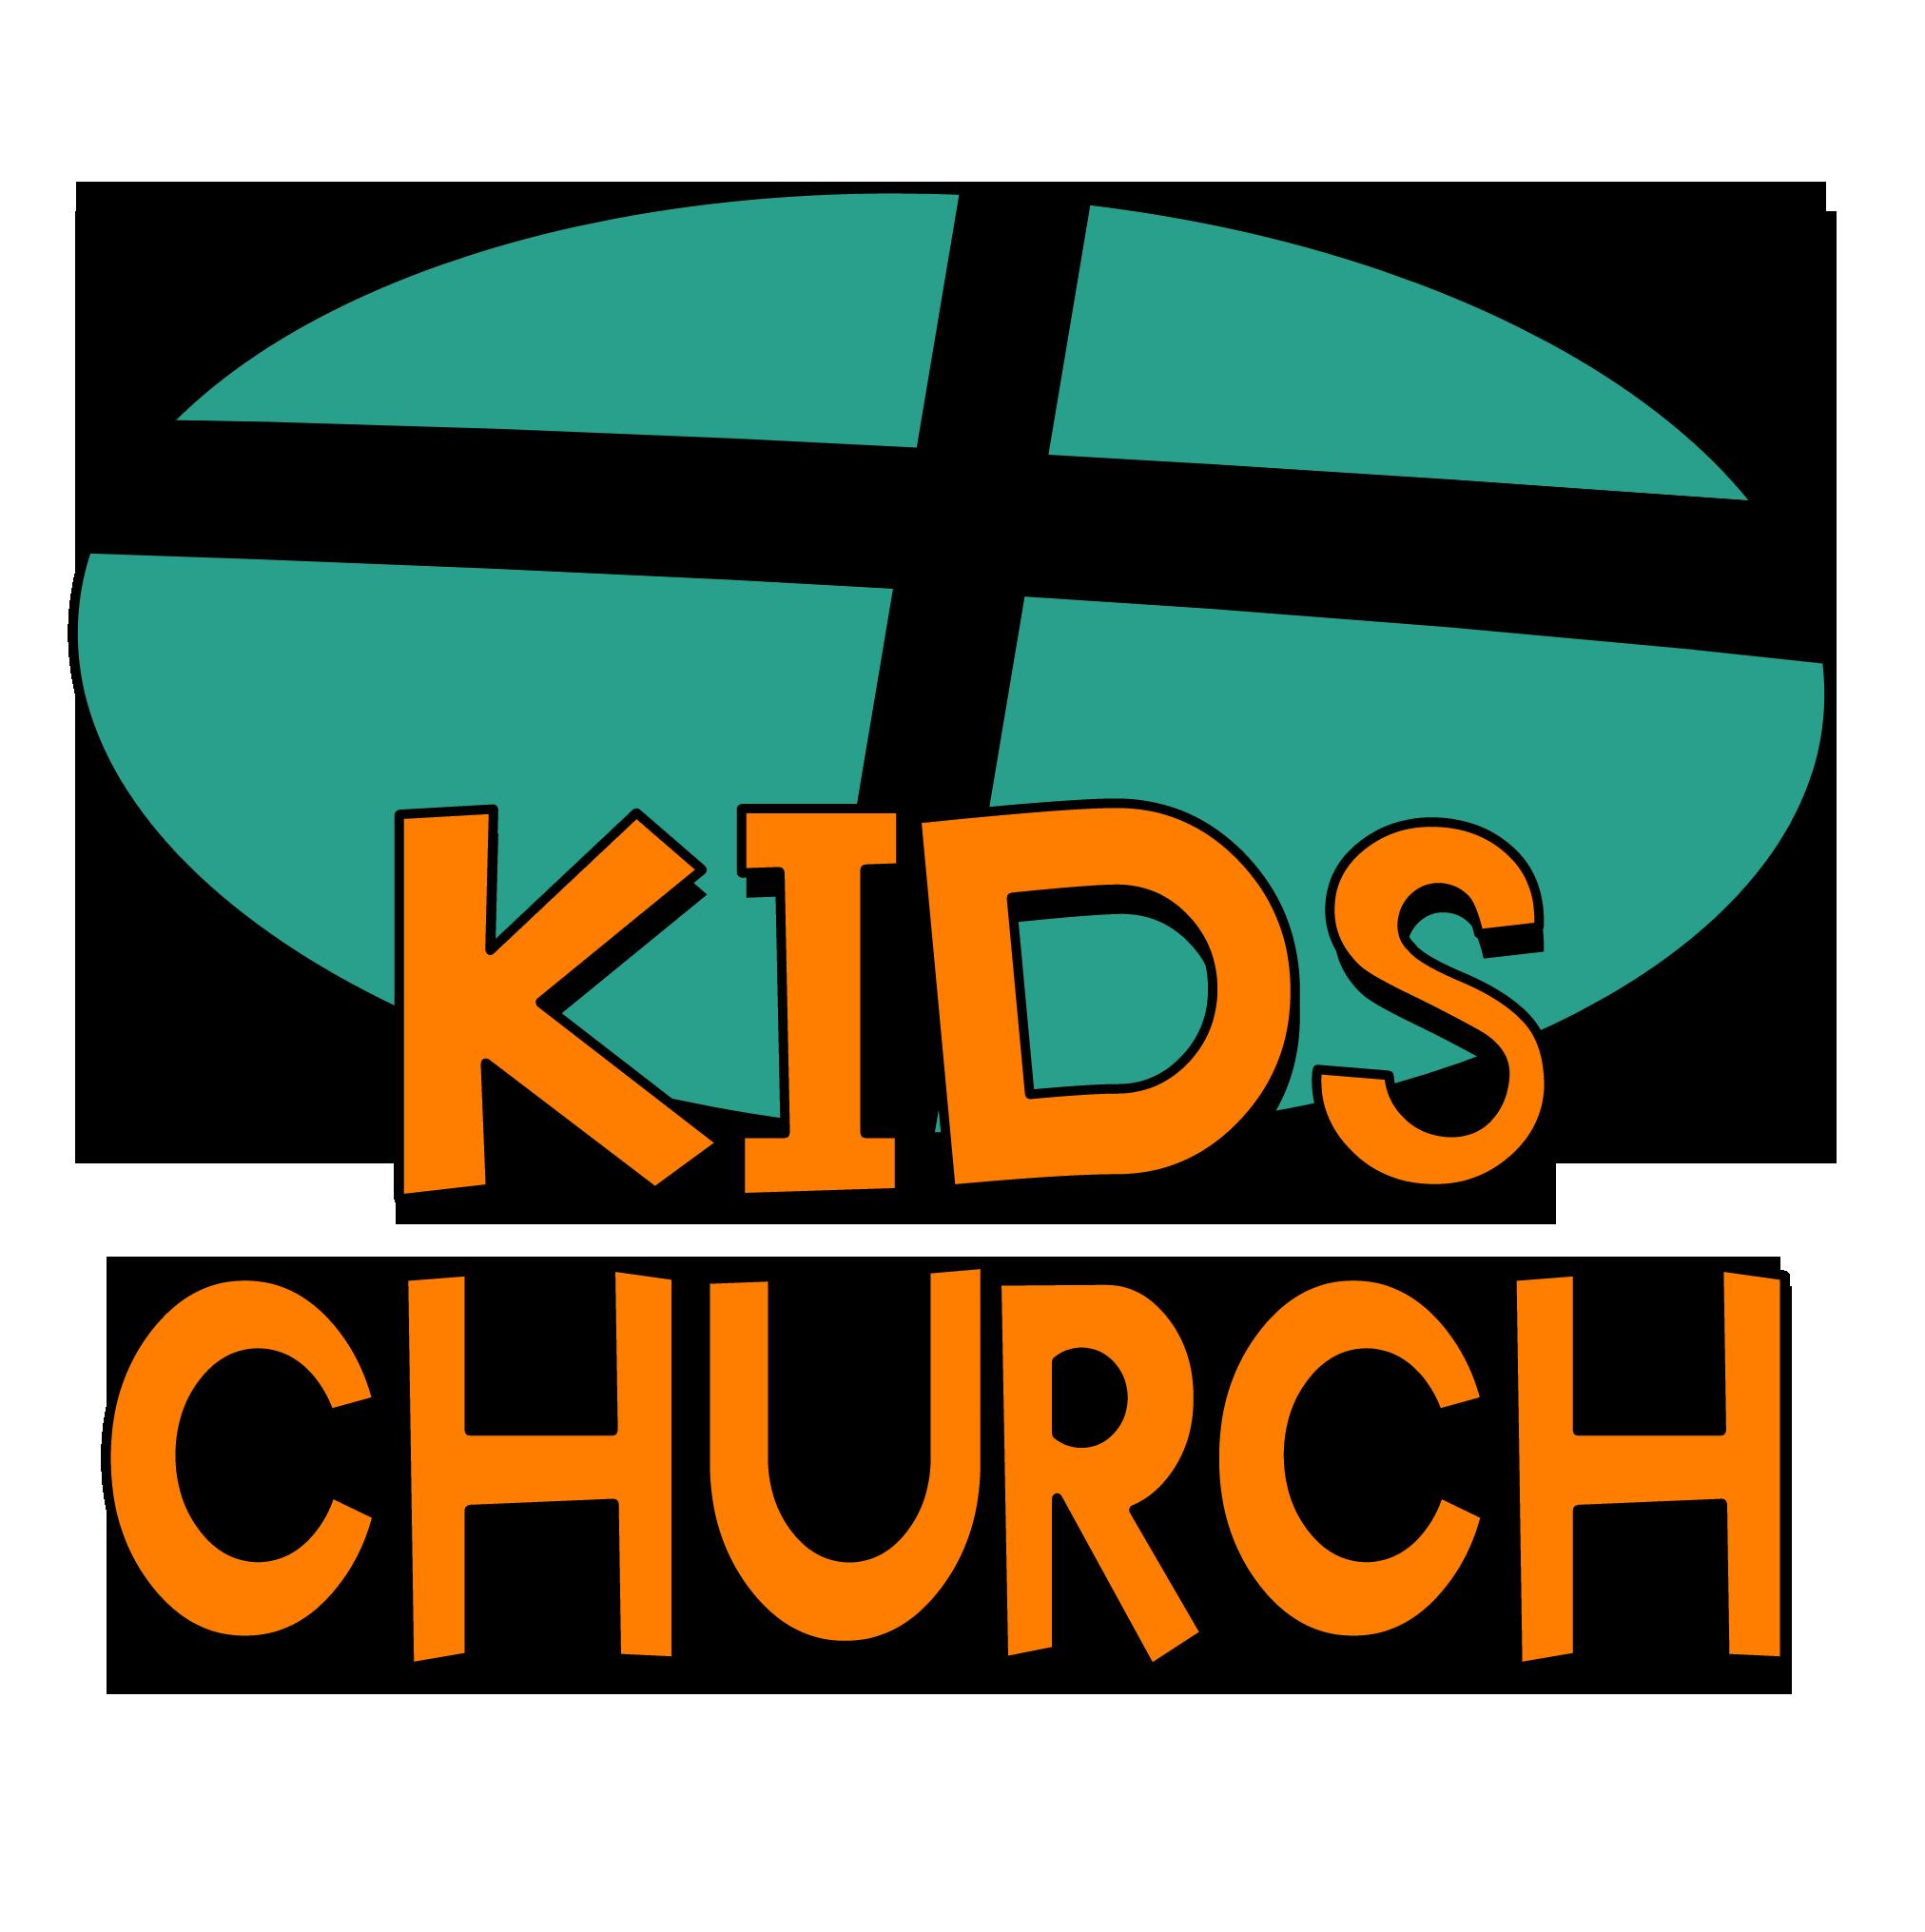 kids-church